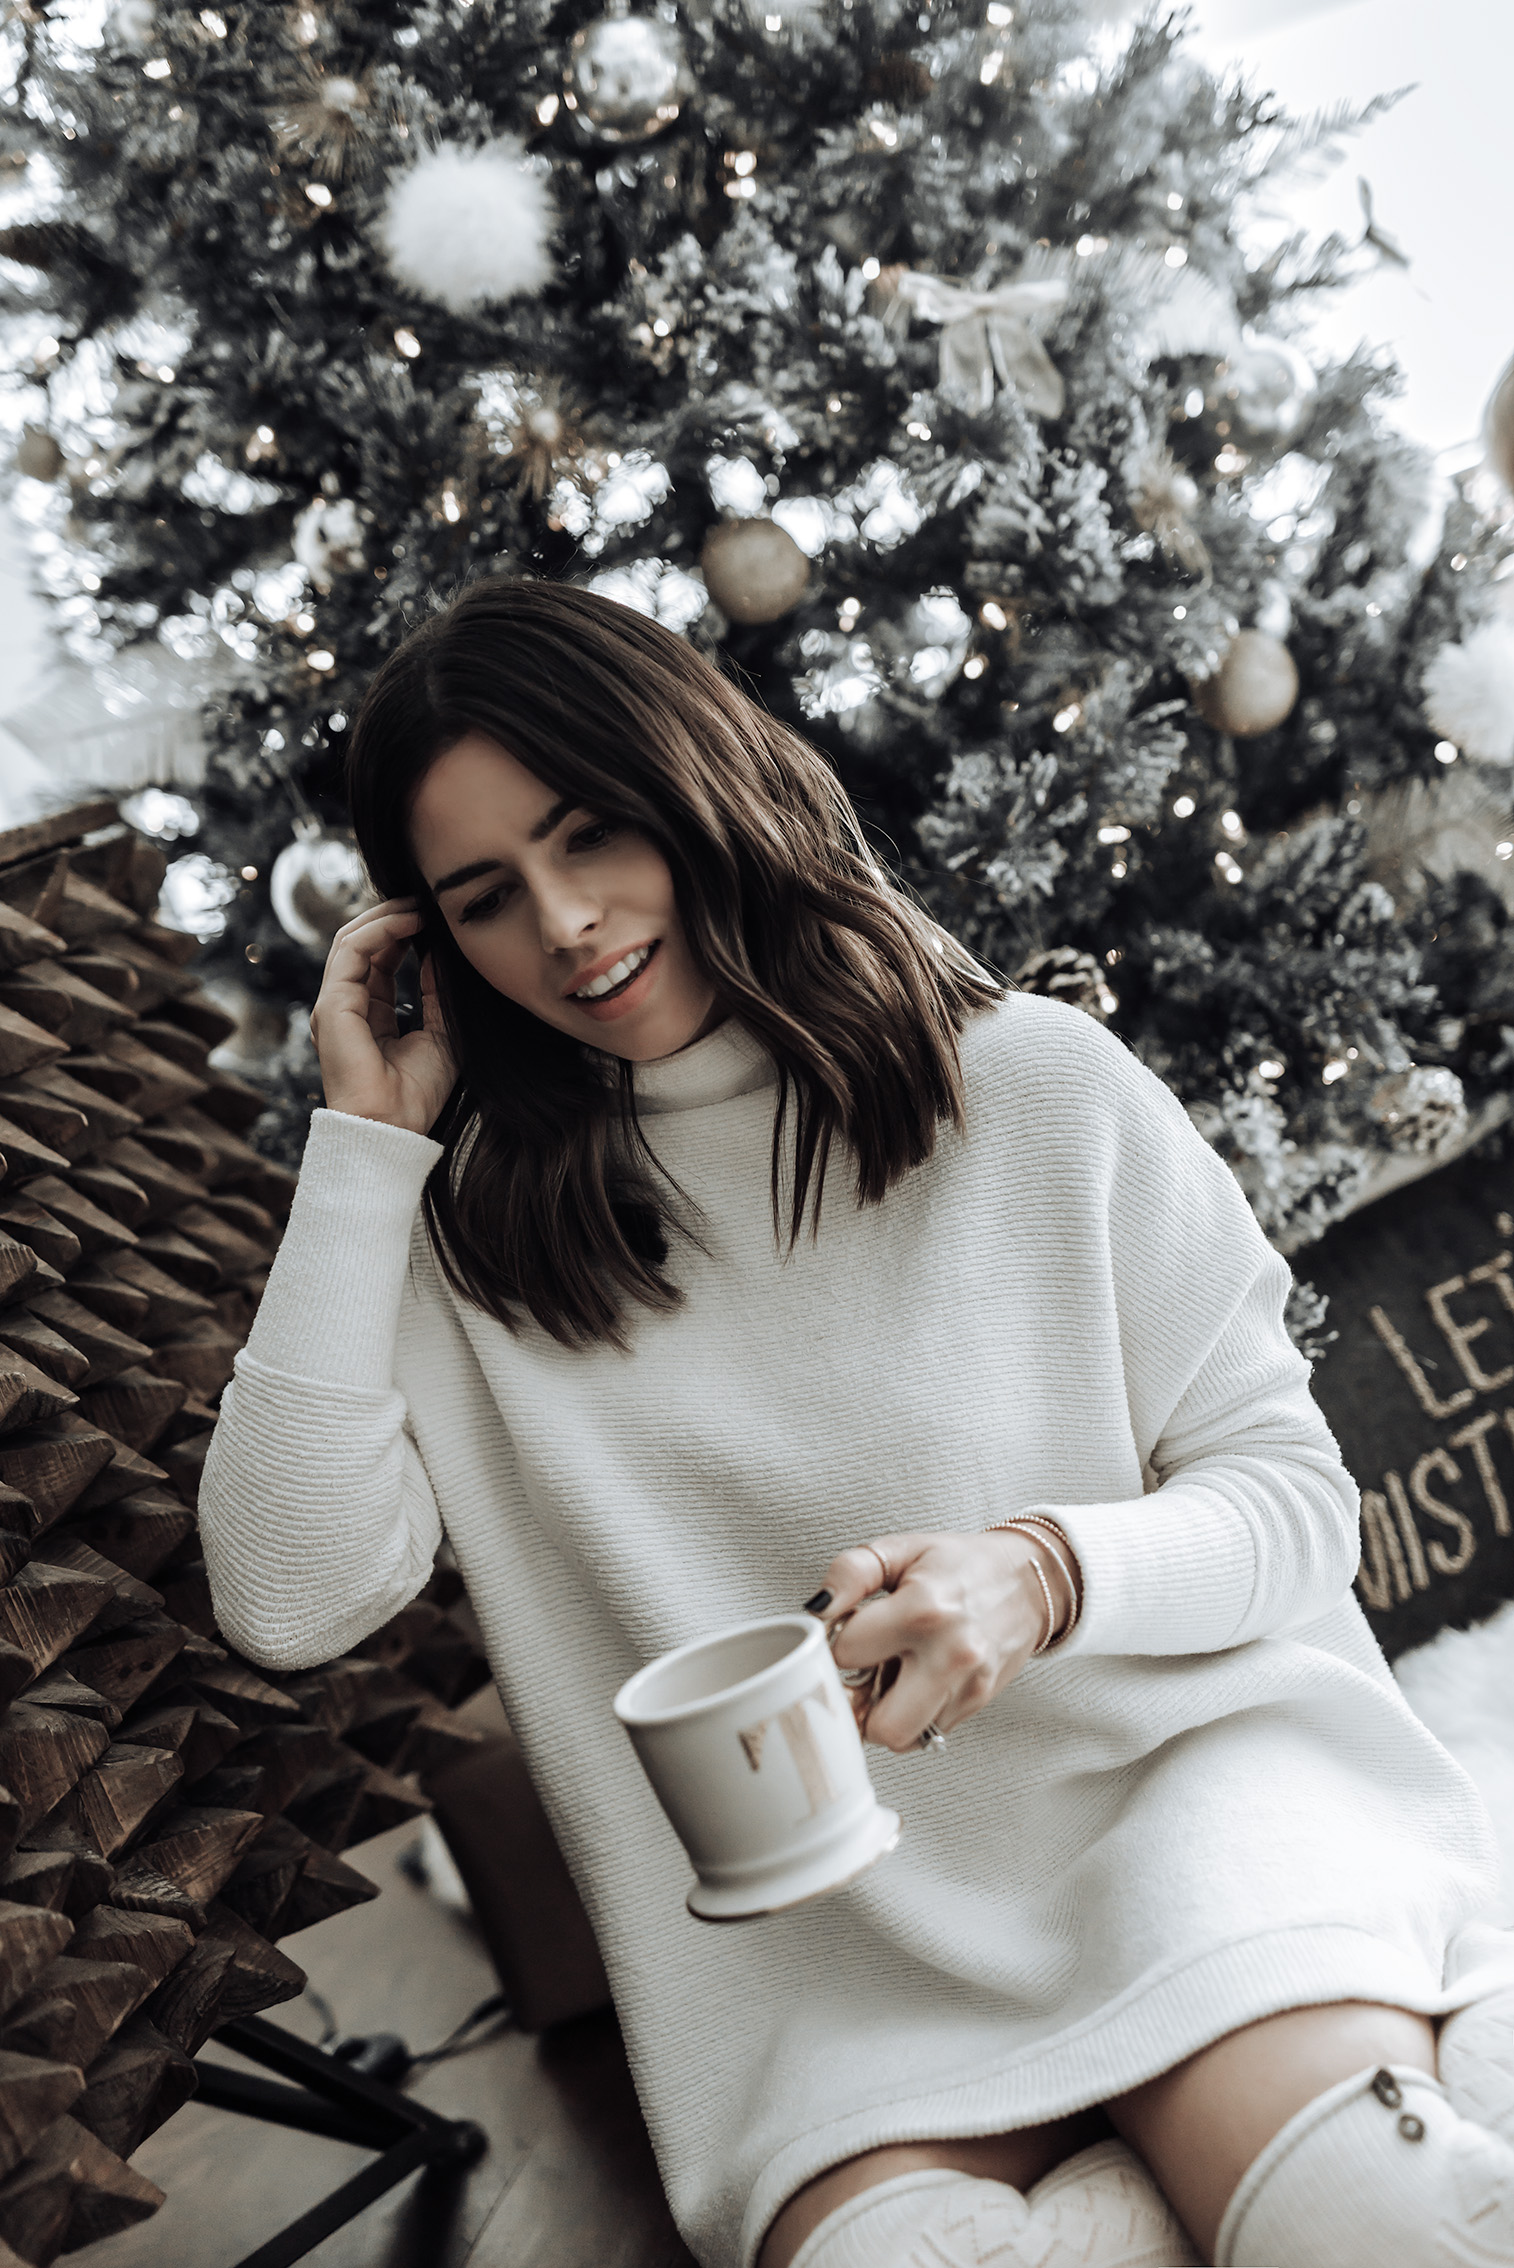 Tiffany Jais fashion and lifestyle blogger of Flaunt and Center | Houston fashion blogger | Simon G. | Streetstyle blog #ootd #jewelry #holidaystyle